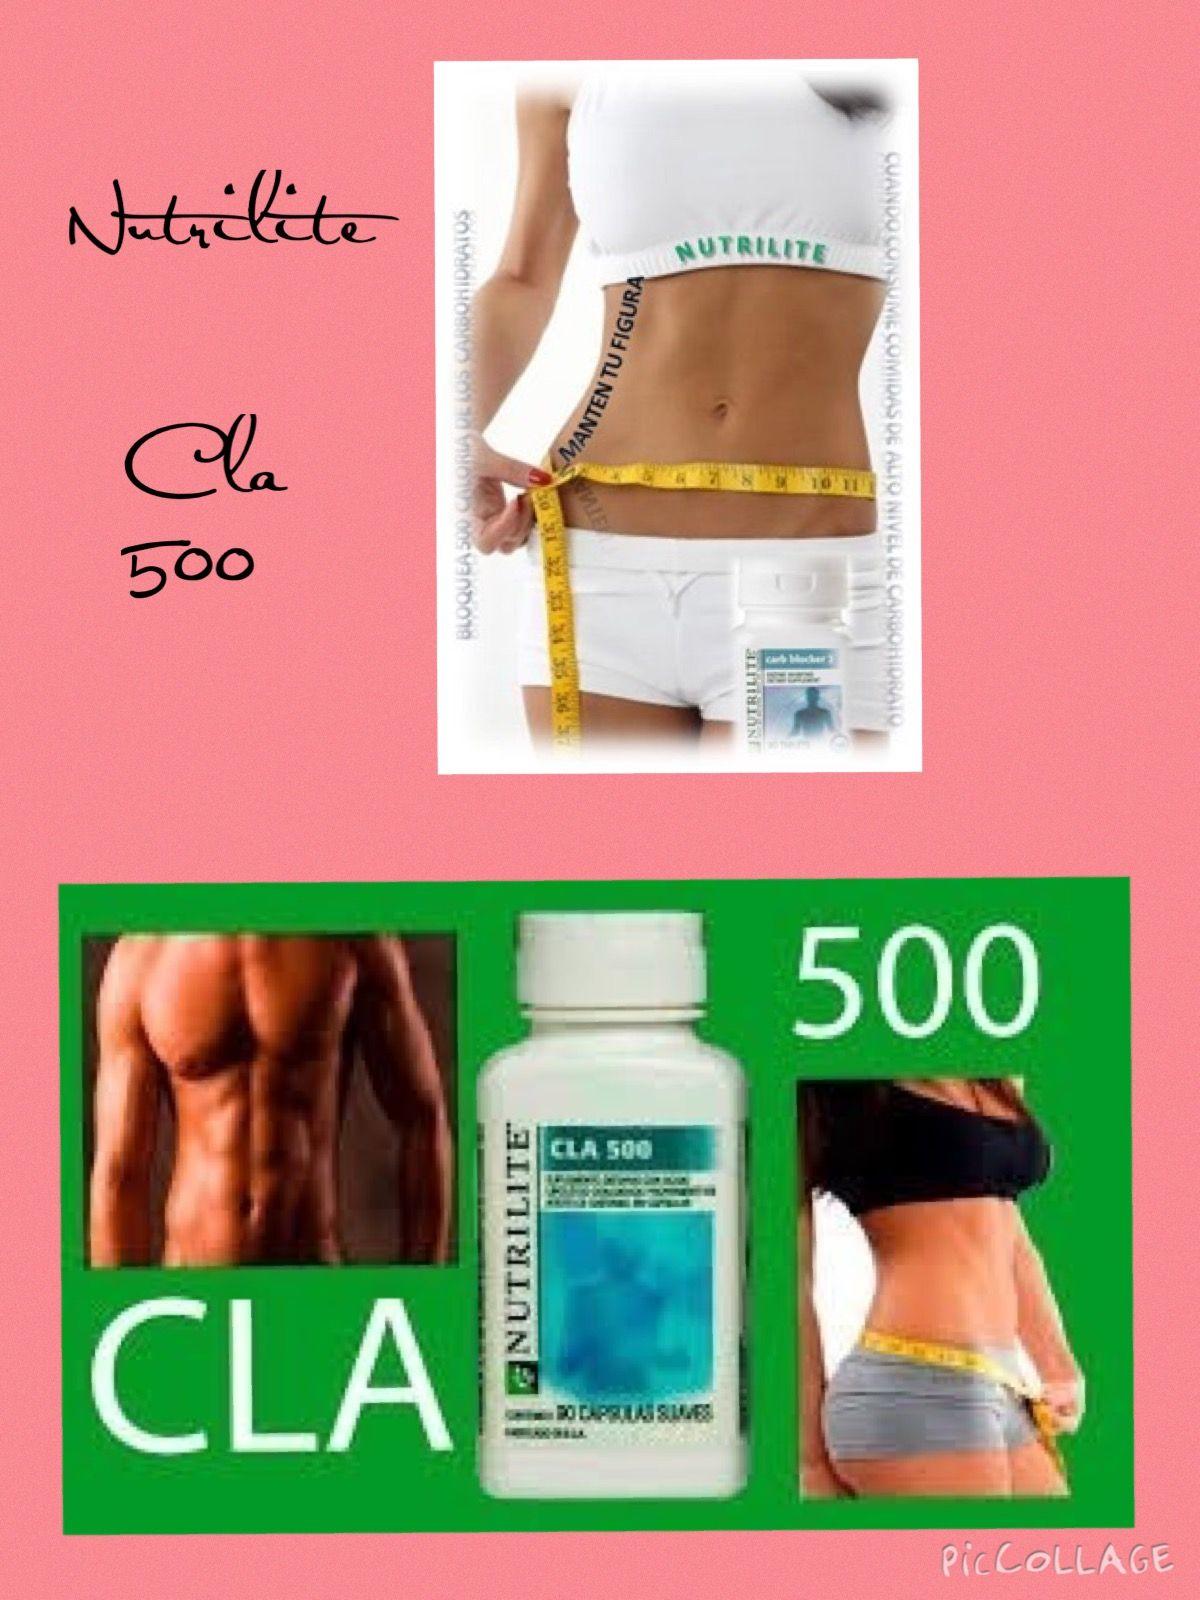 Nutrilite: Cla 500 Lose fat, not muscle!  http://www.amway.com/EBinternational/Shop/Product/Category.aspx?_sort=Newest%7CD&dsnav=N:4294966625